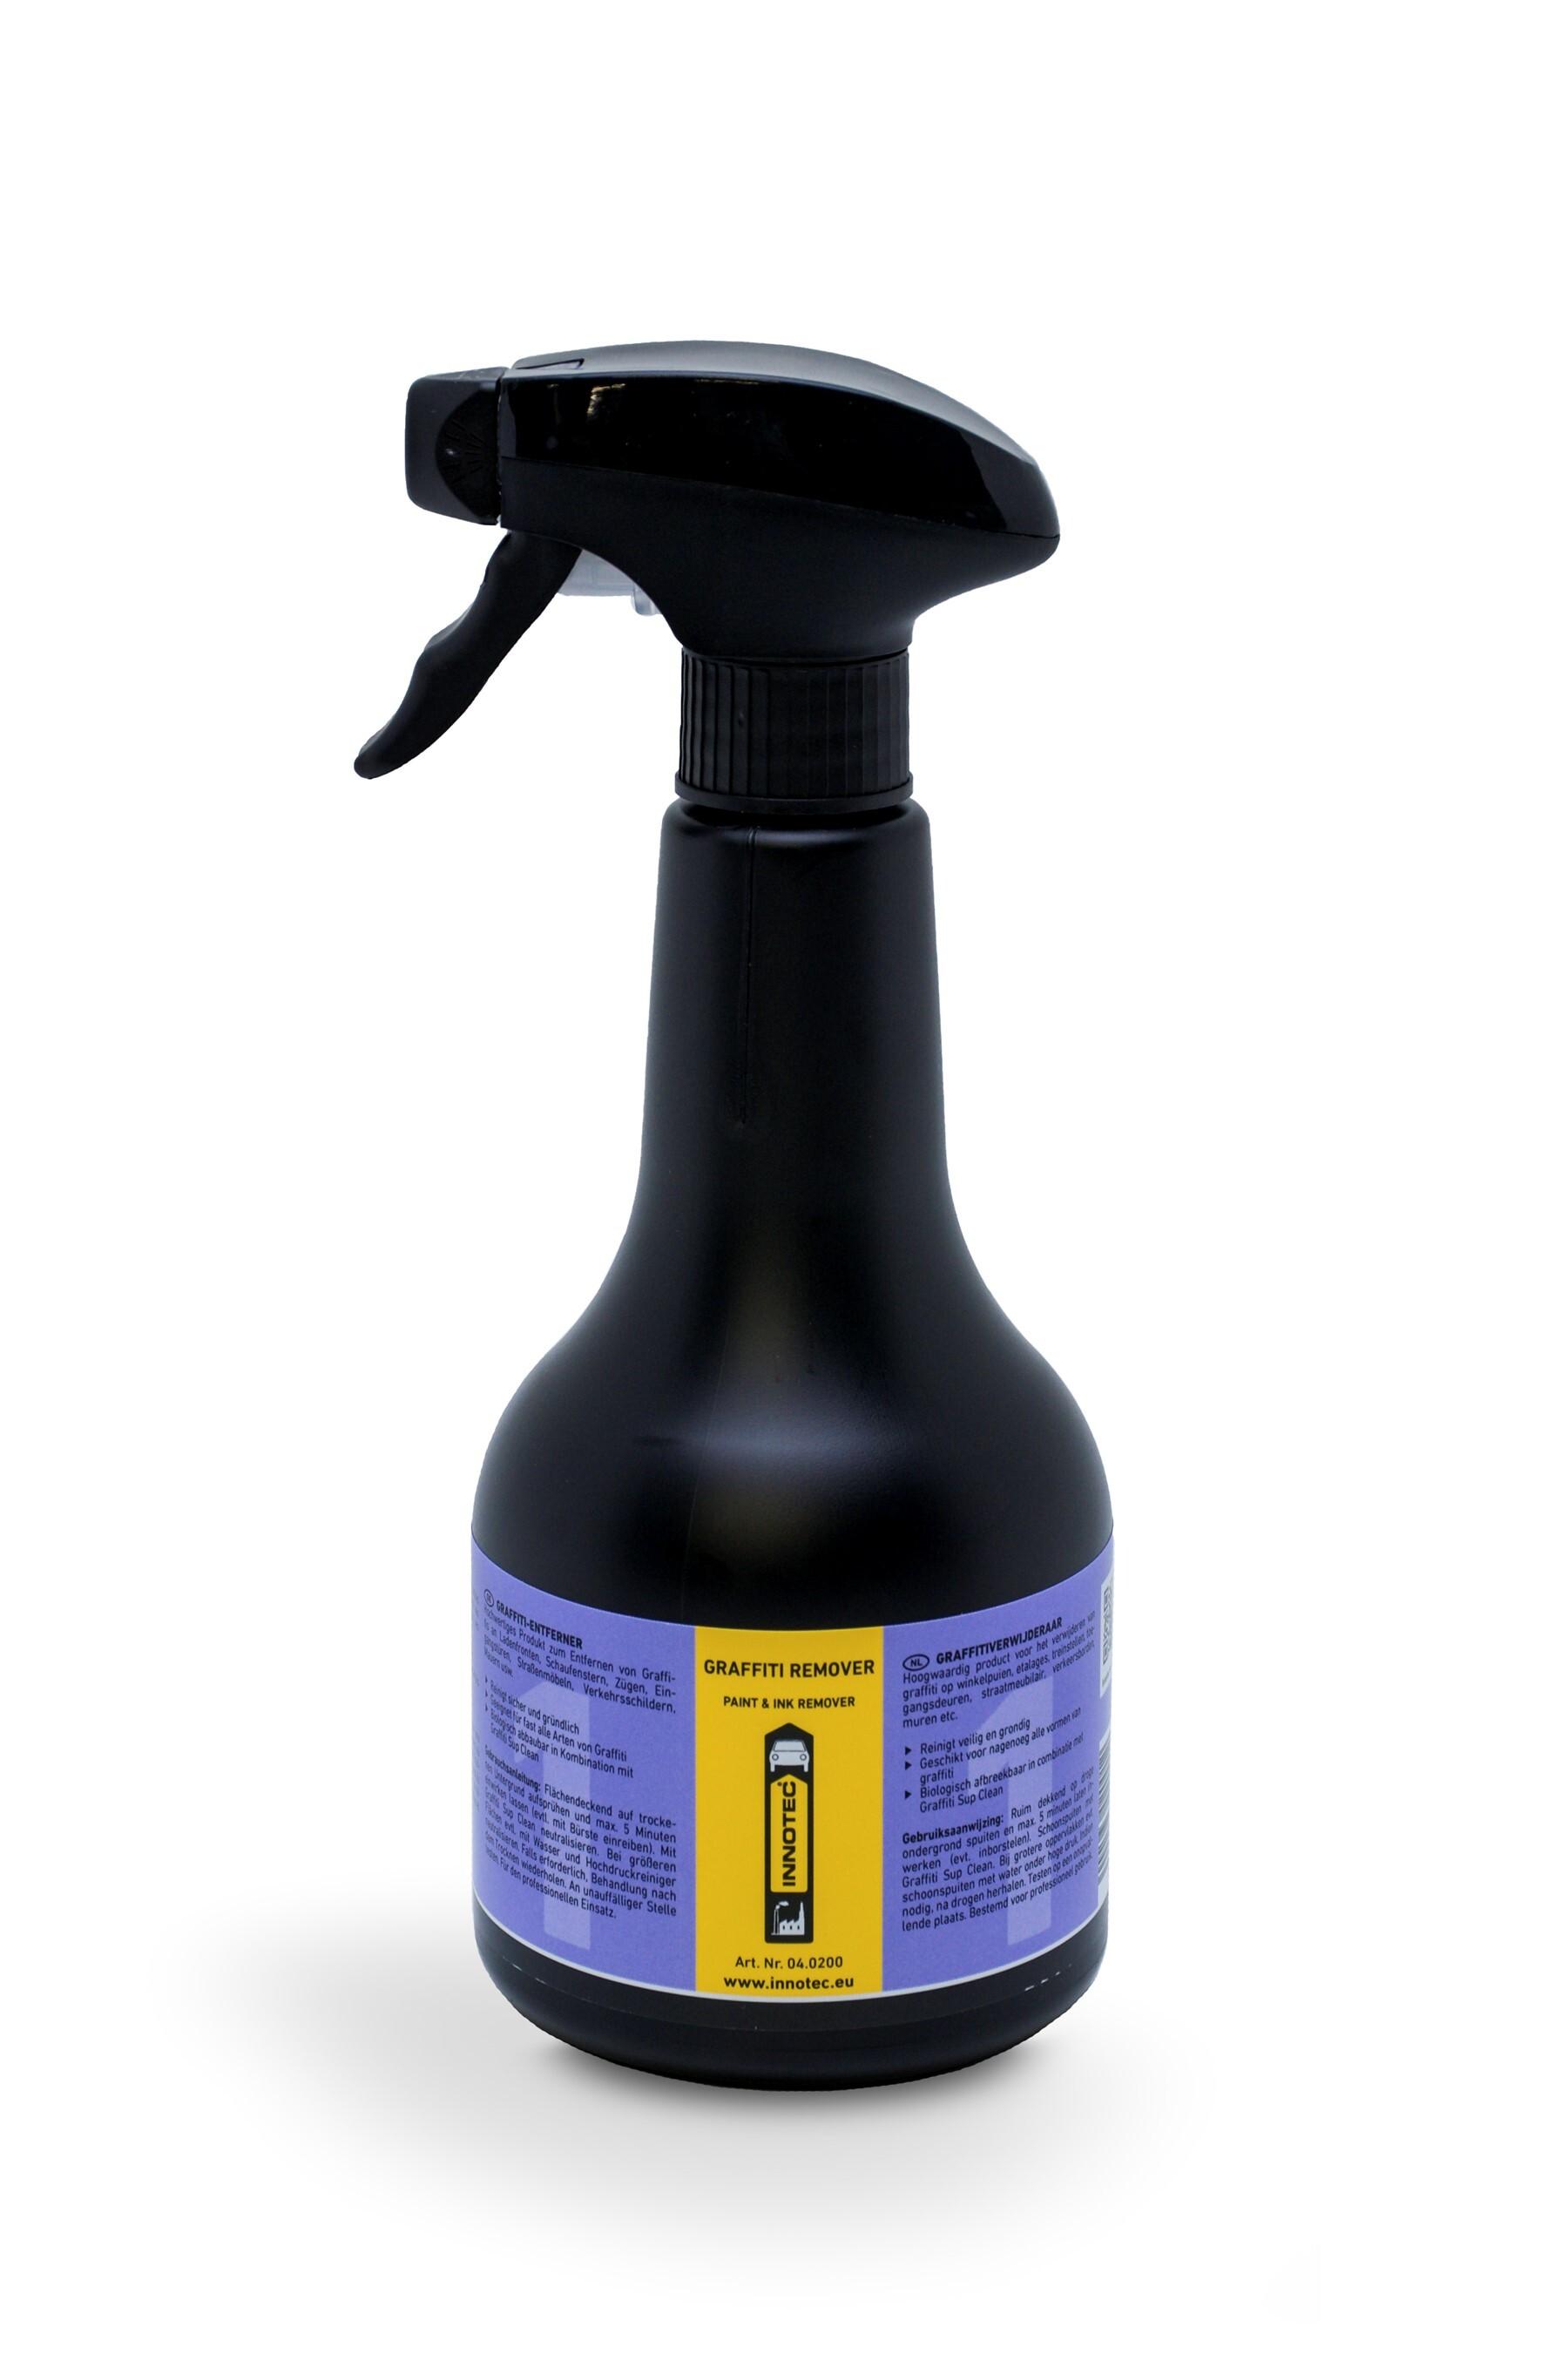 1750 1 Graffiti Remover 500 ml BULBFLES 2 0 2020